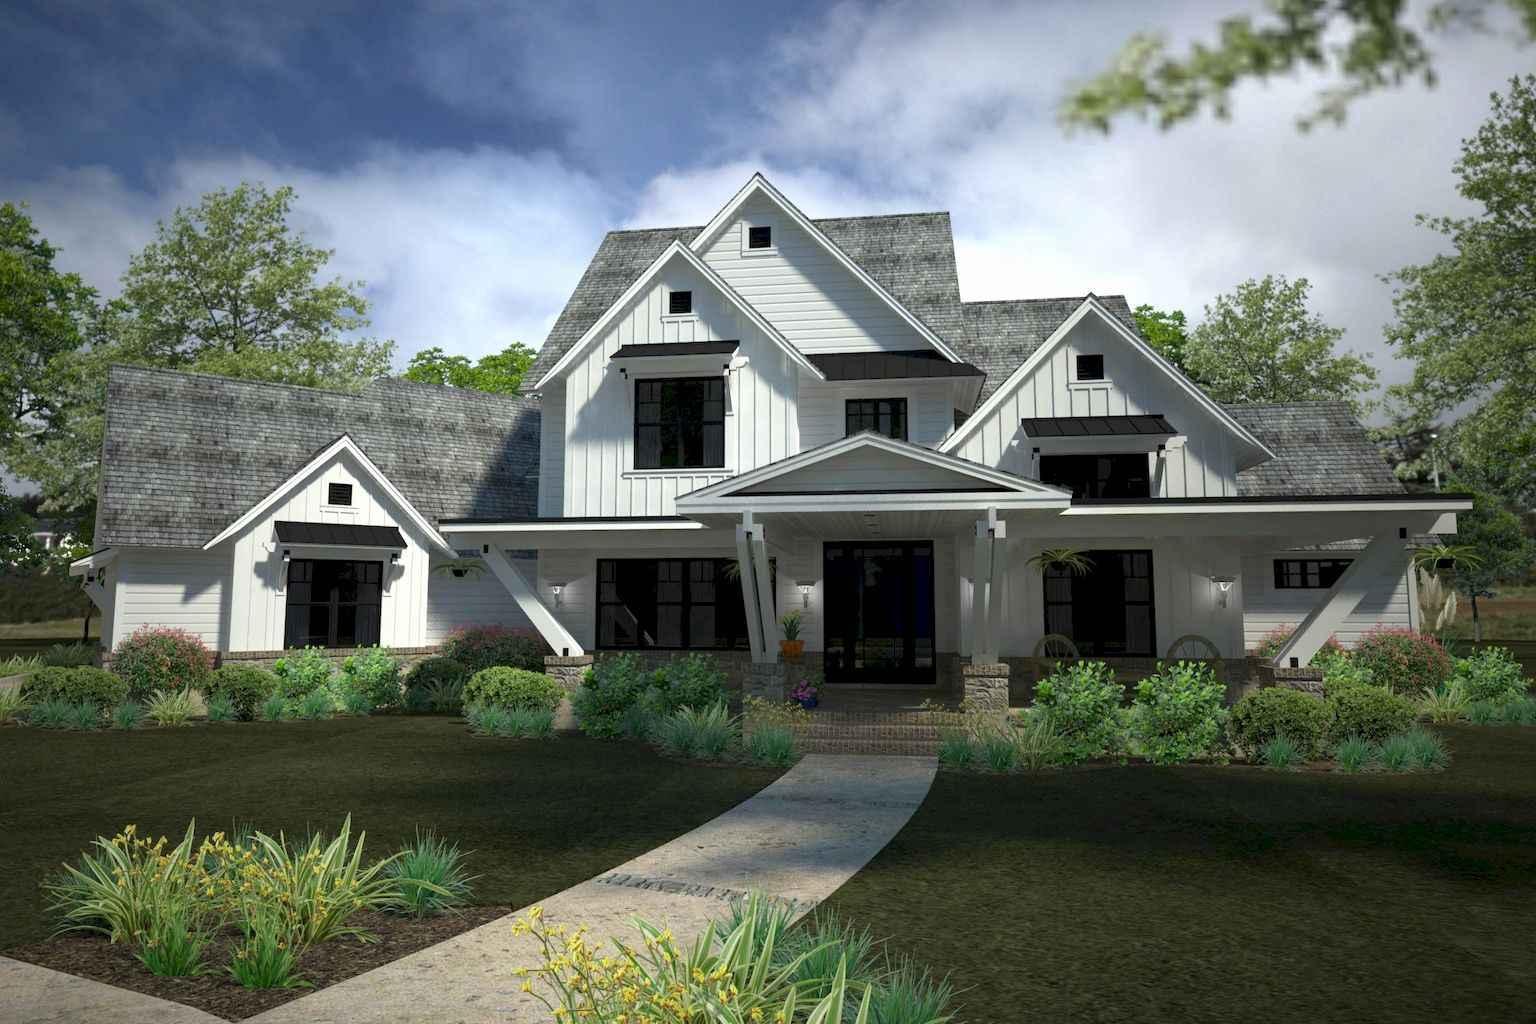 60 amazing farmhouse plans cracker style design ideas (13)